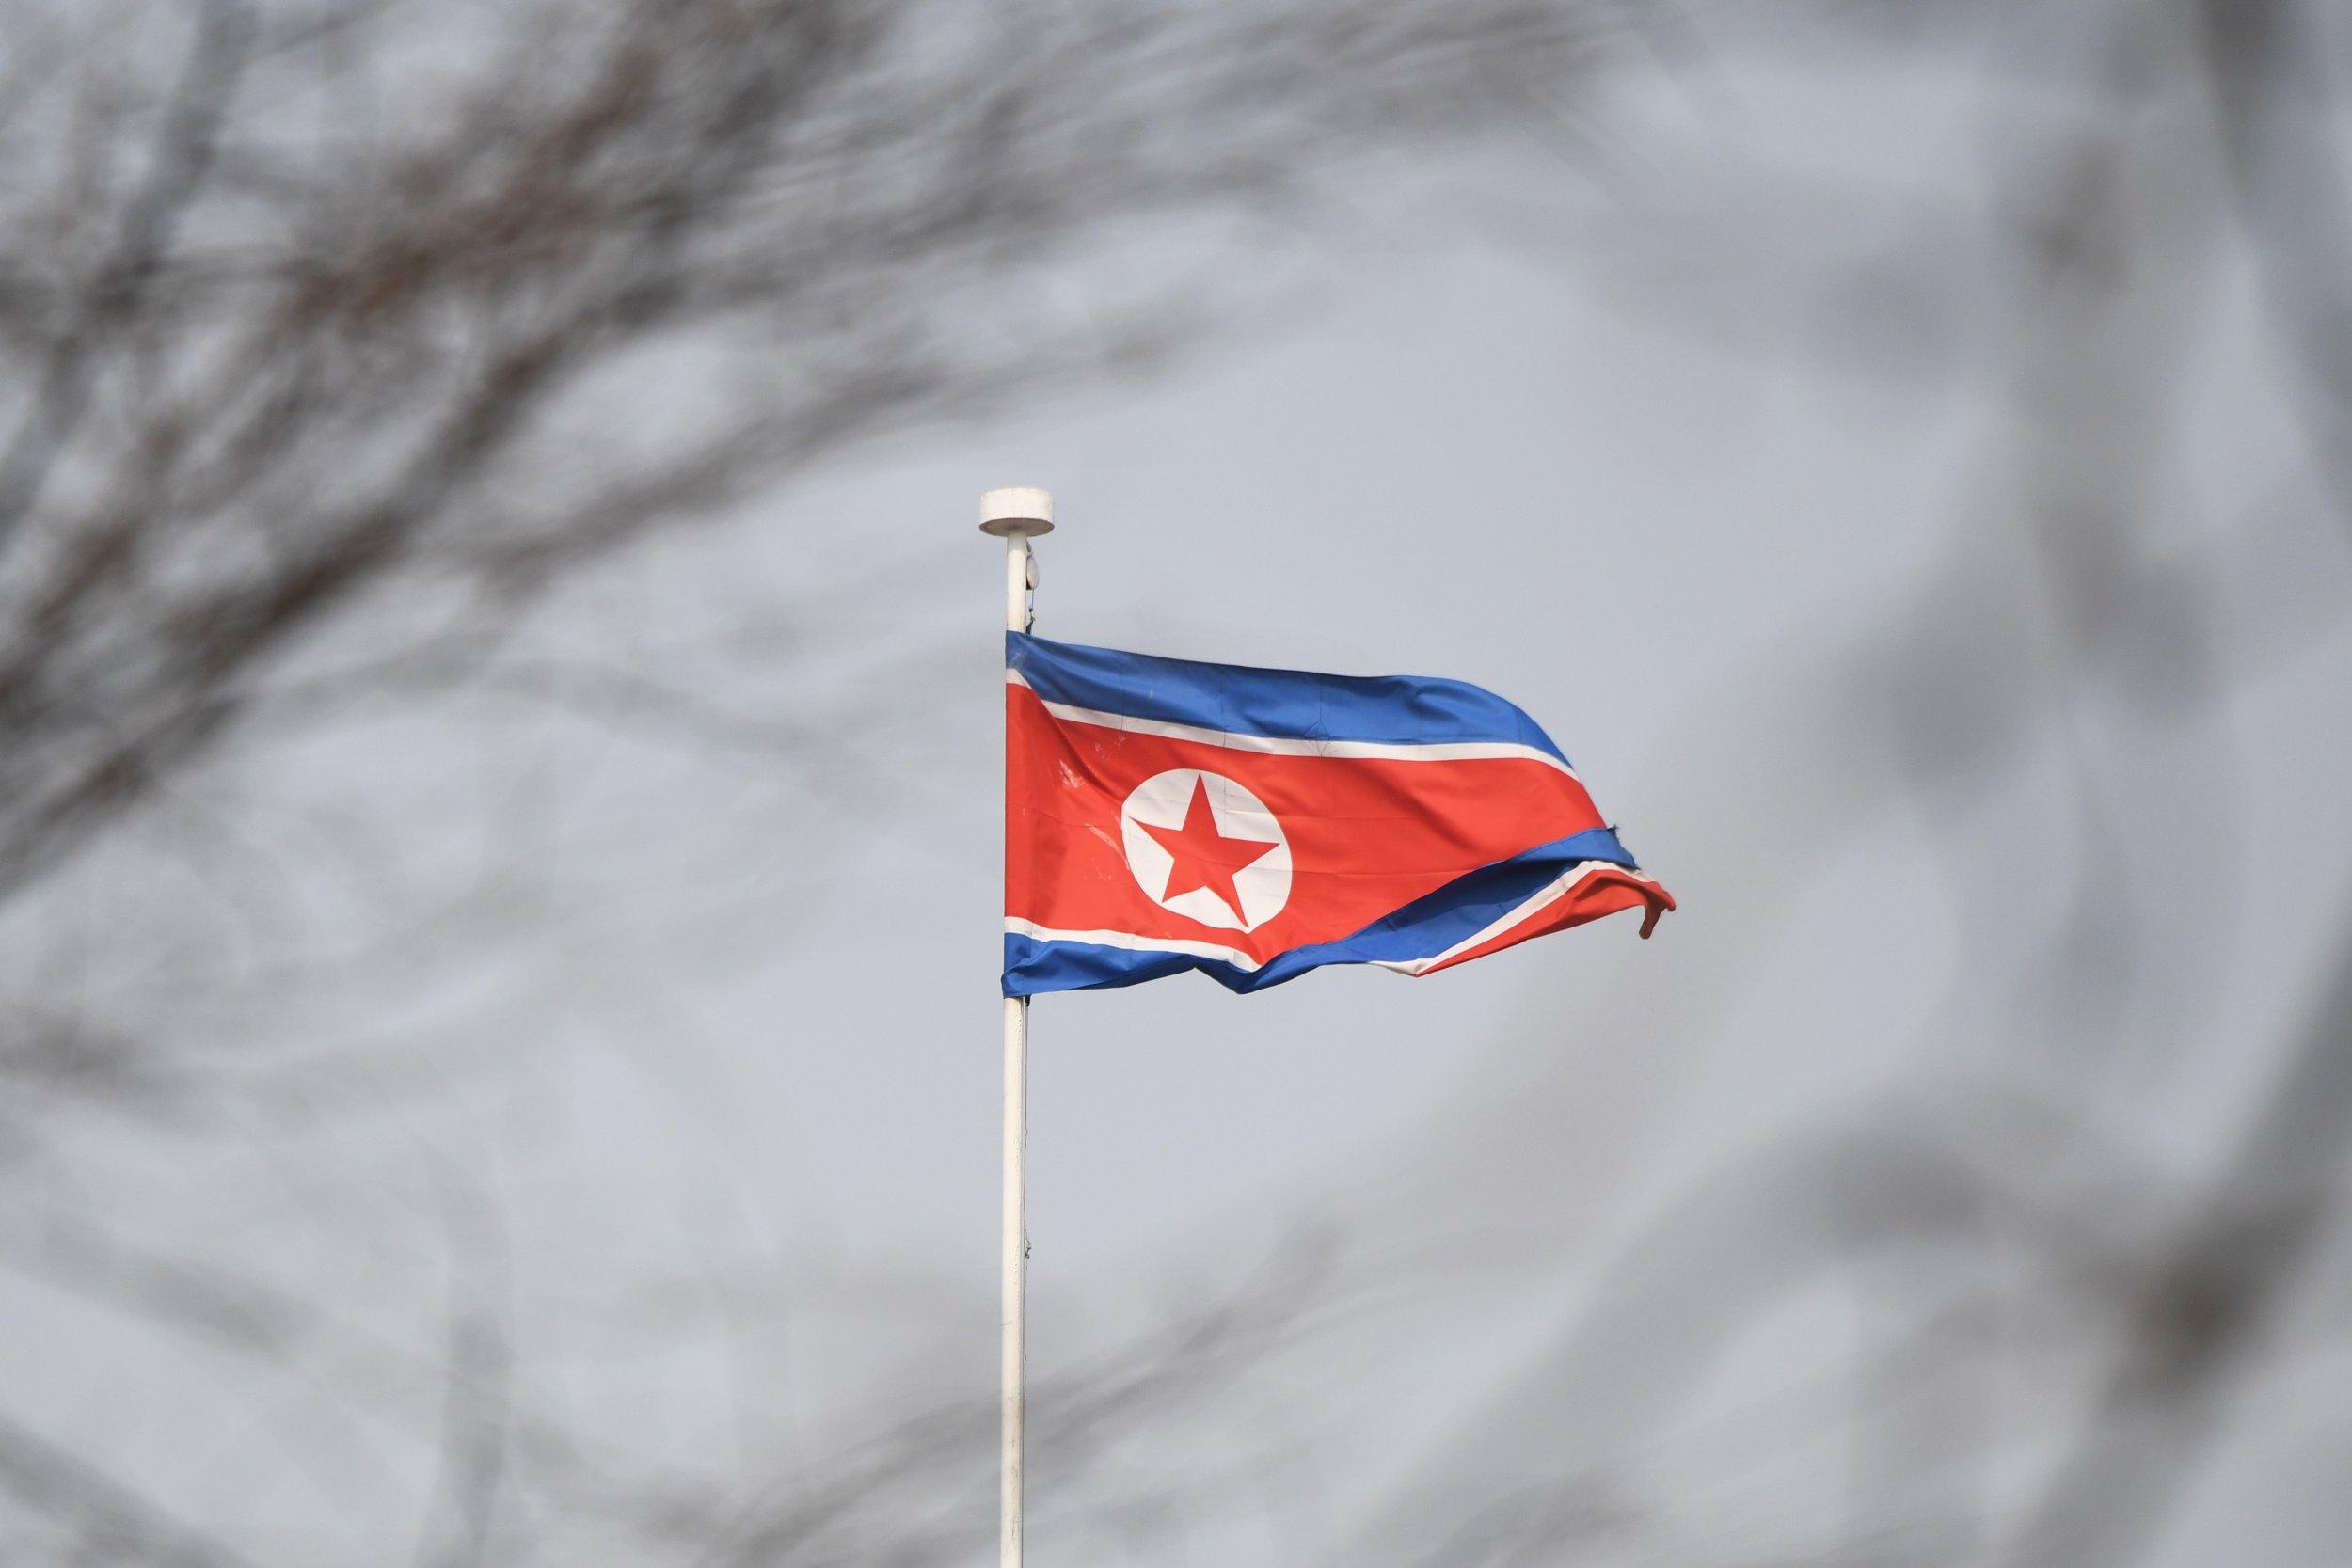 North Korean flag ambassador missing Italy